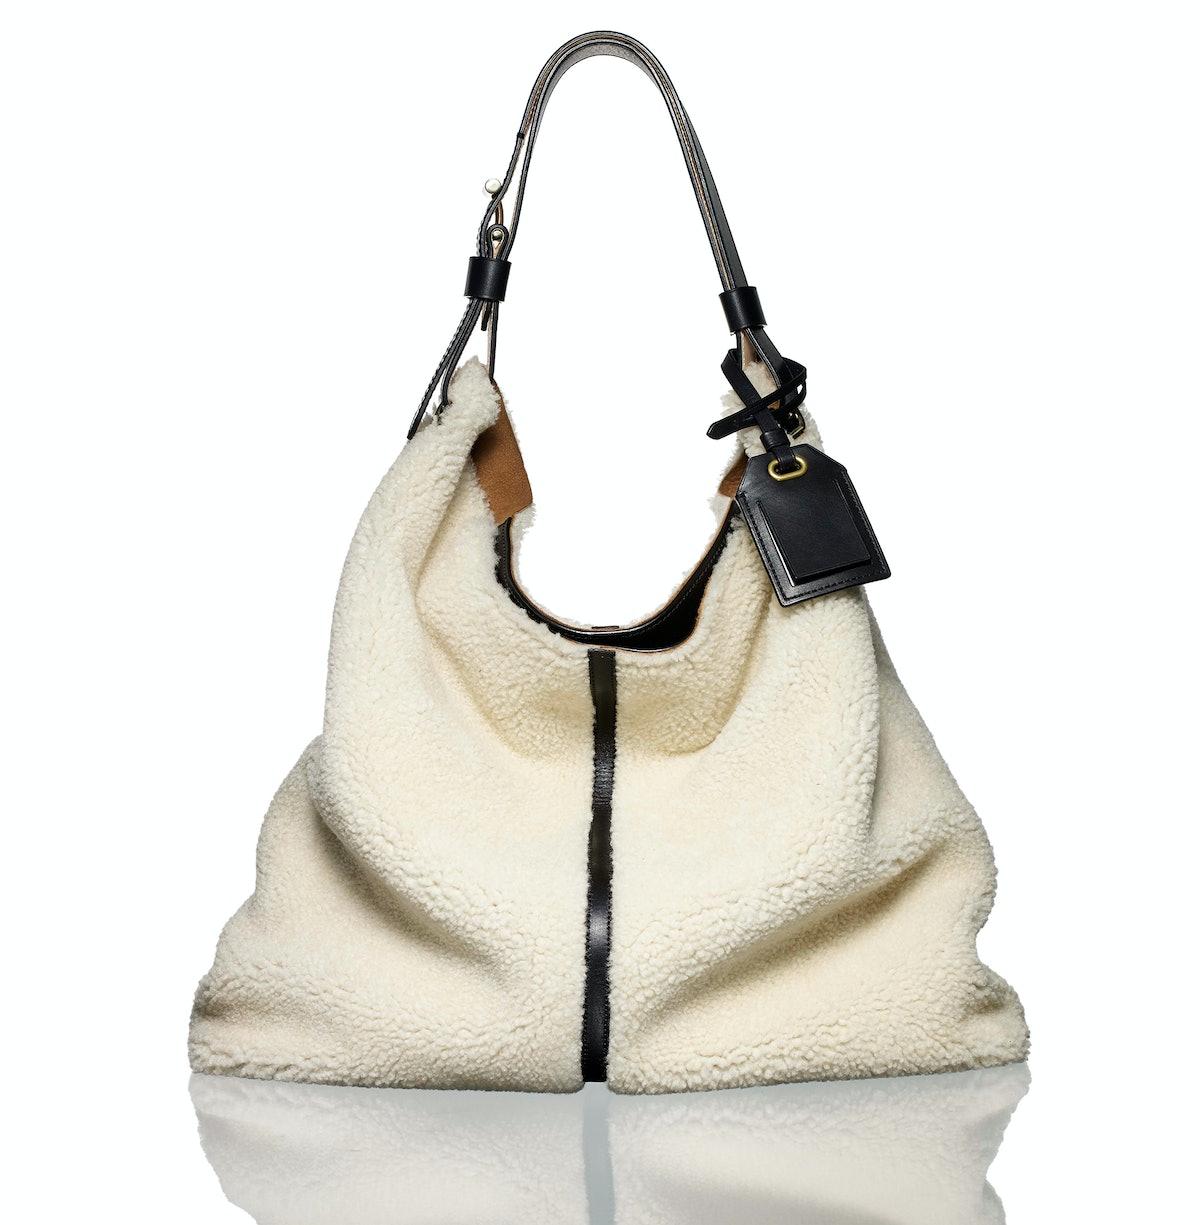 Reed Krakoff bag